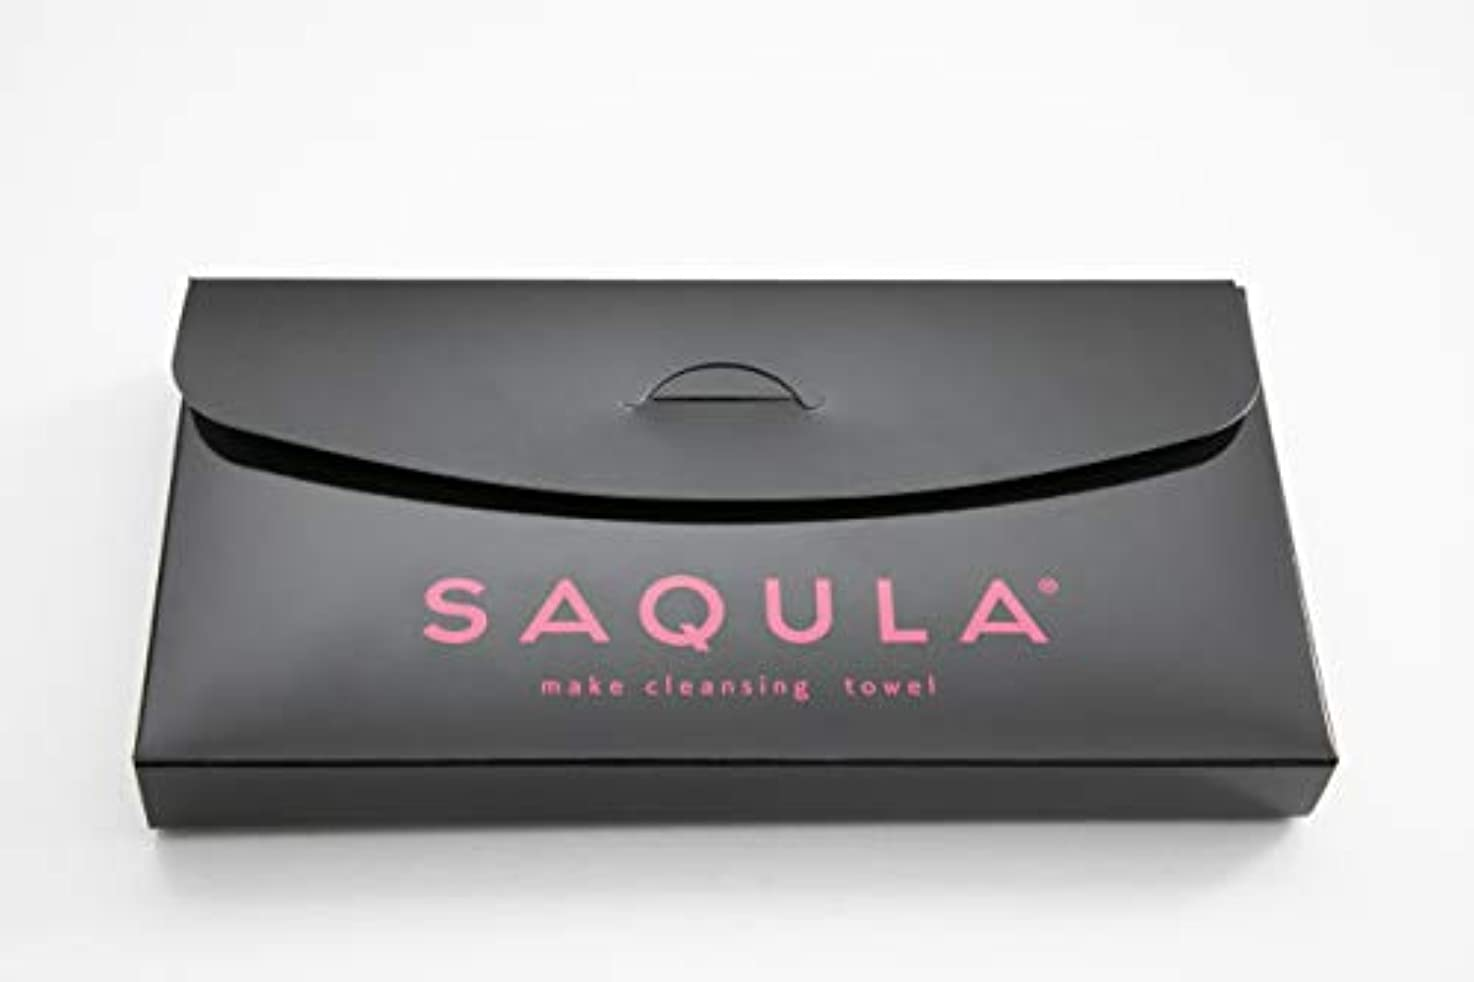 SAQULA クレンジングタオル ピンク テレビで紹介された 水に濡らして拭くだけで簡単にメイクが落とせるクレンジングタオル